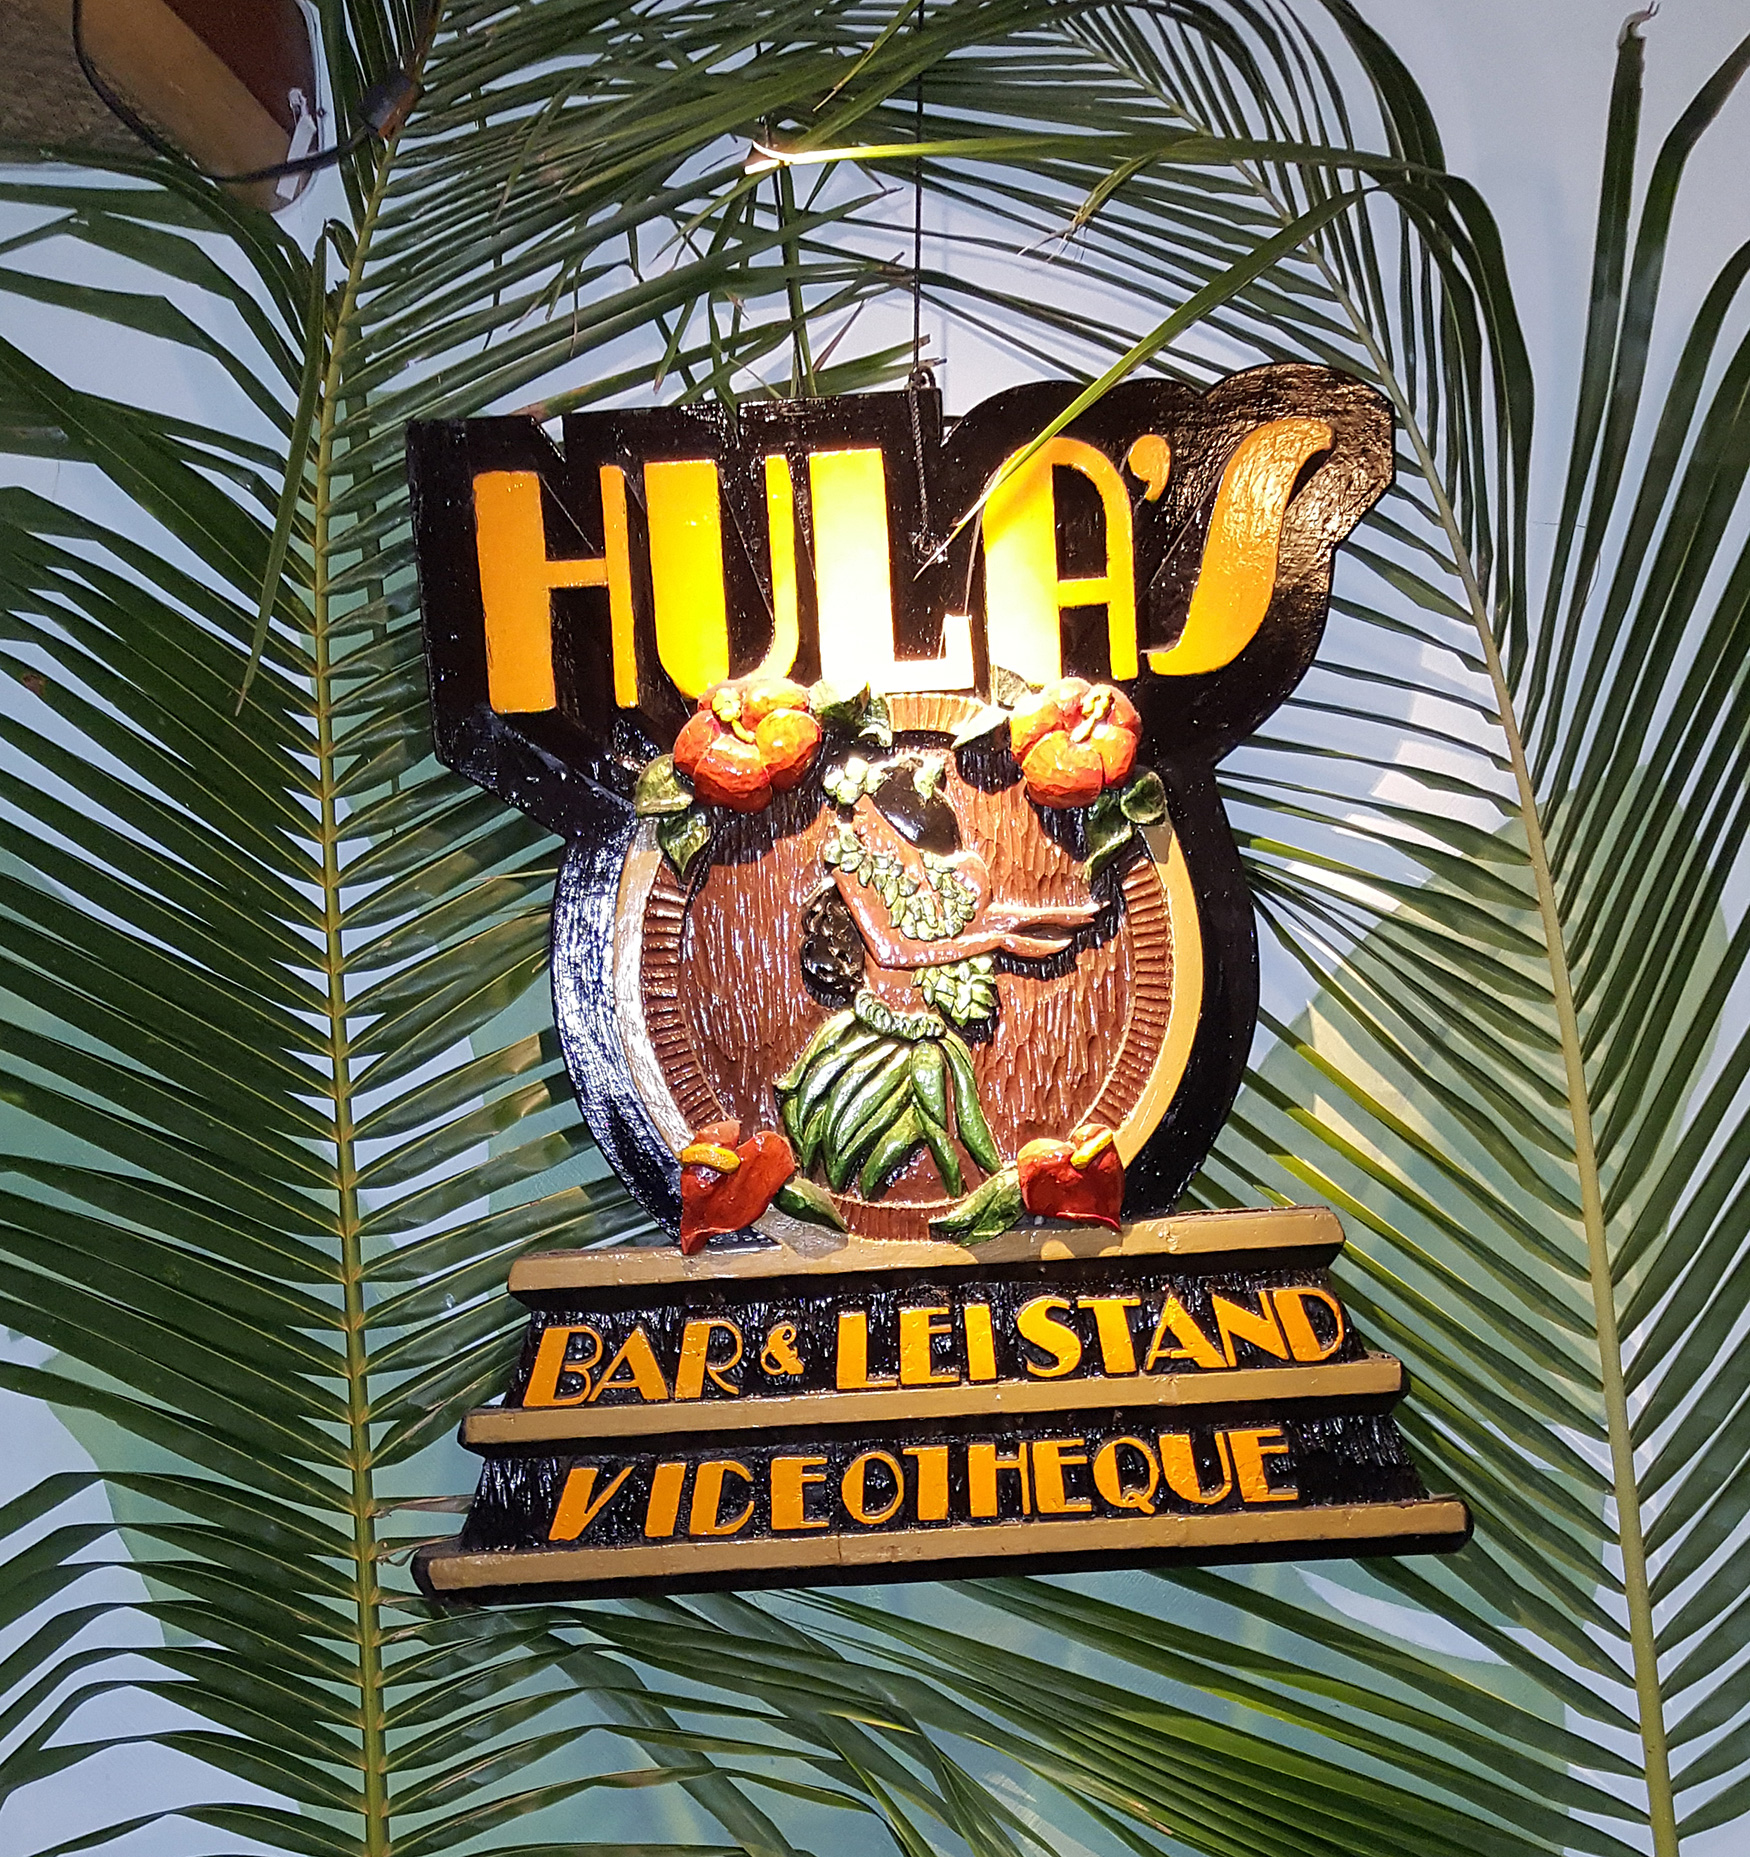 Coverage Hula S 43rd Anniversary Celebration Tasty Island